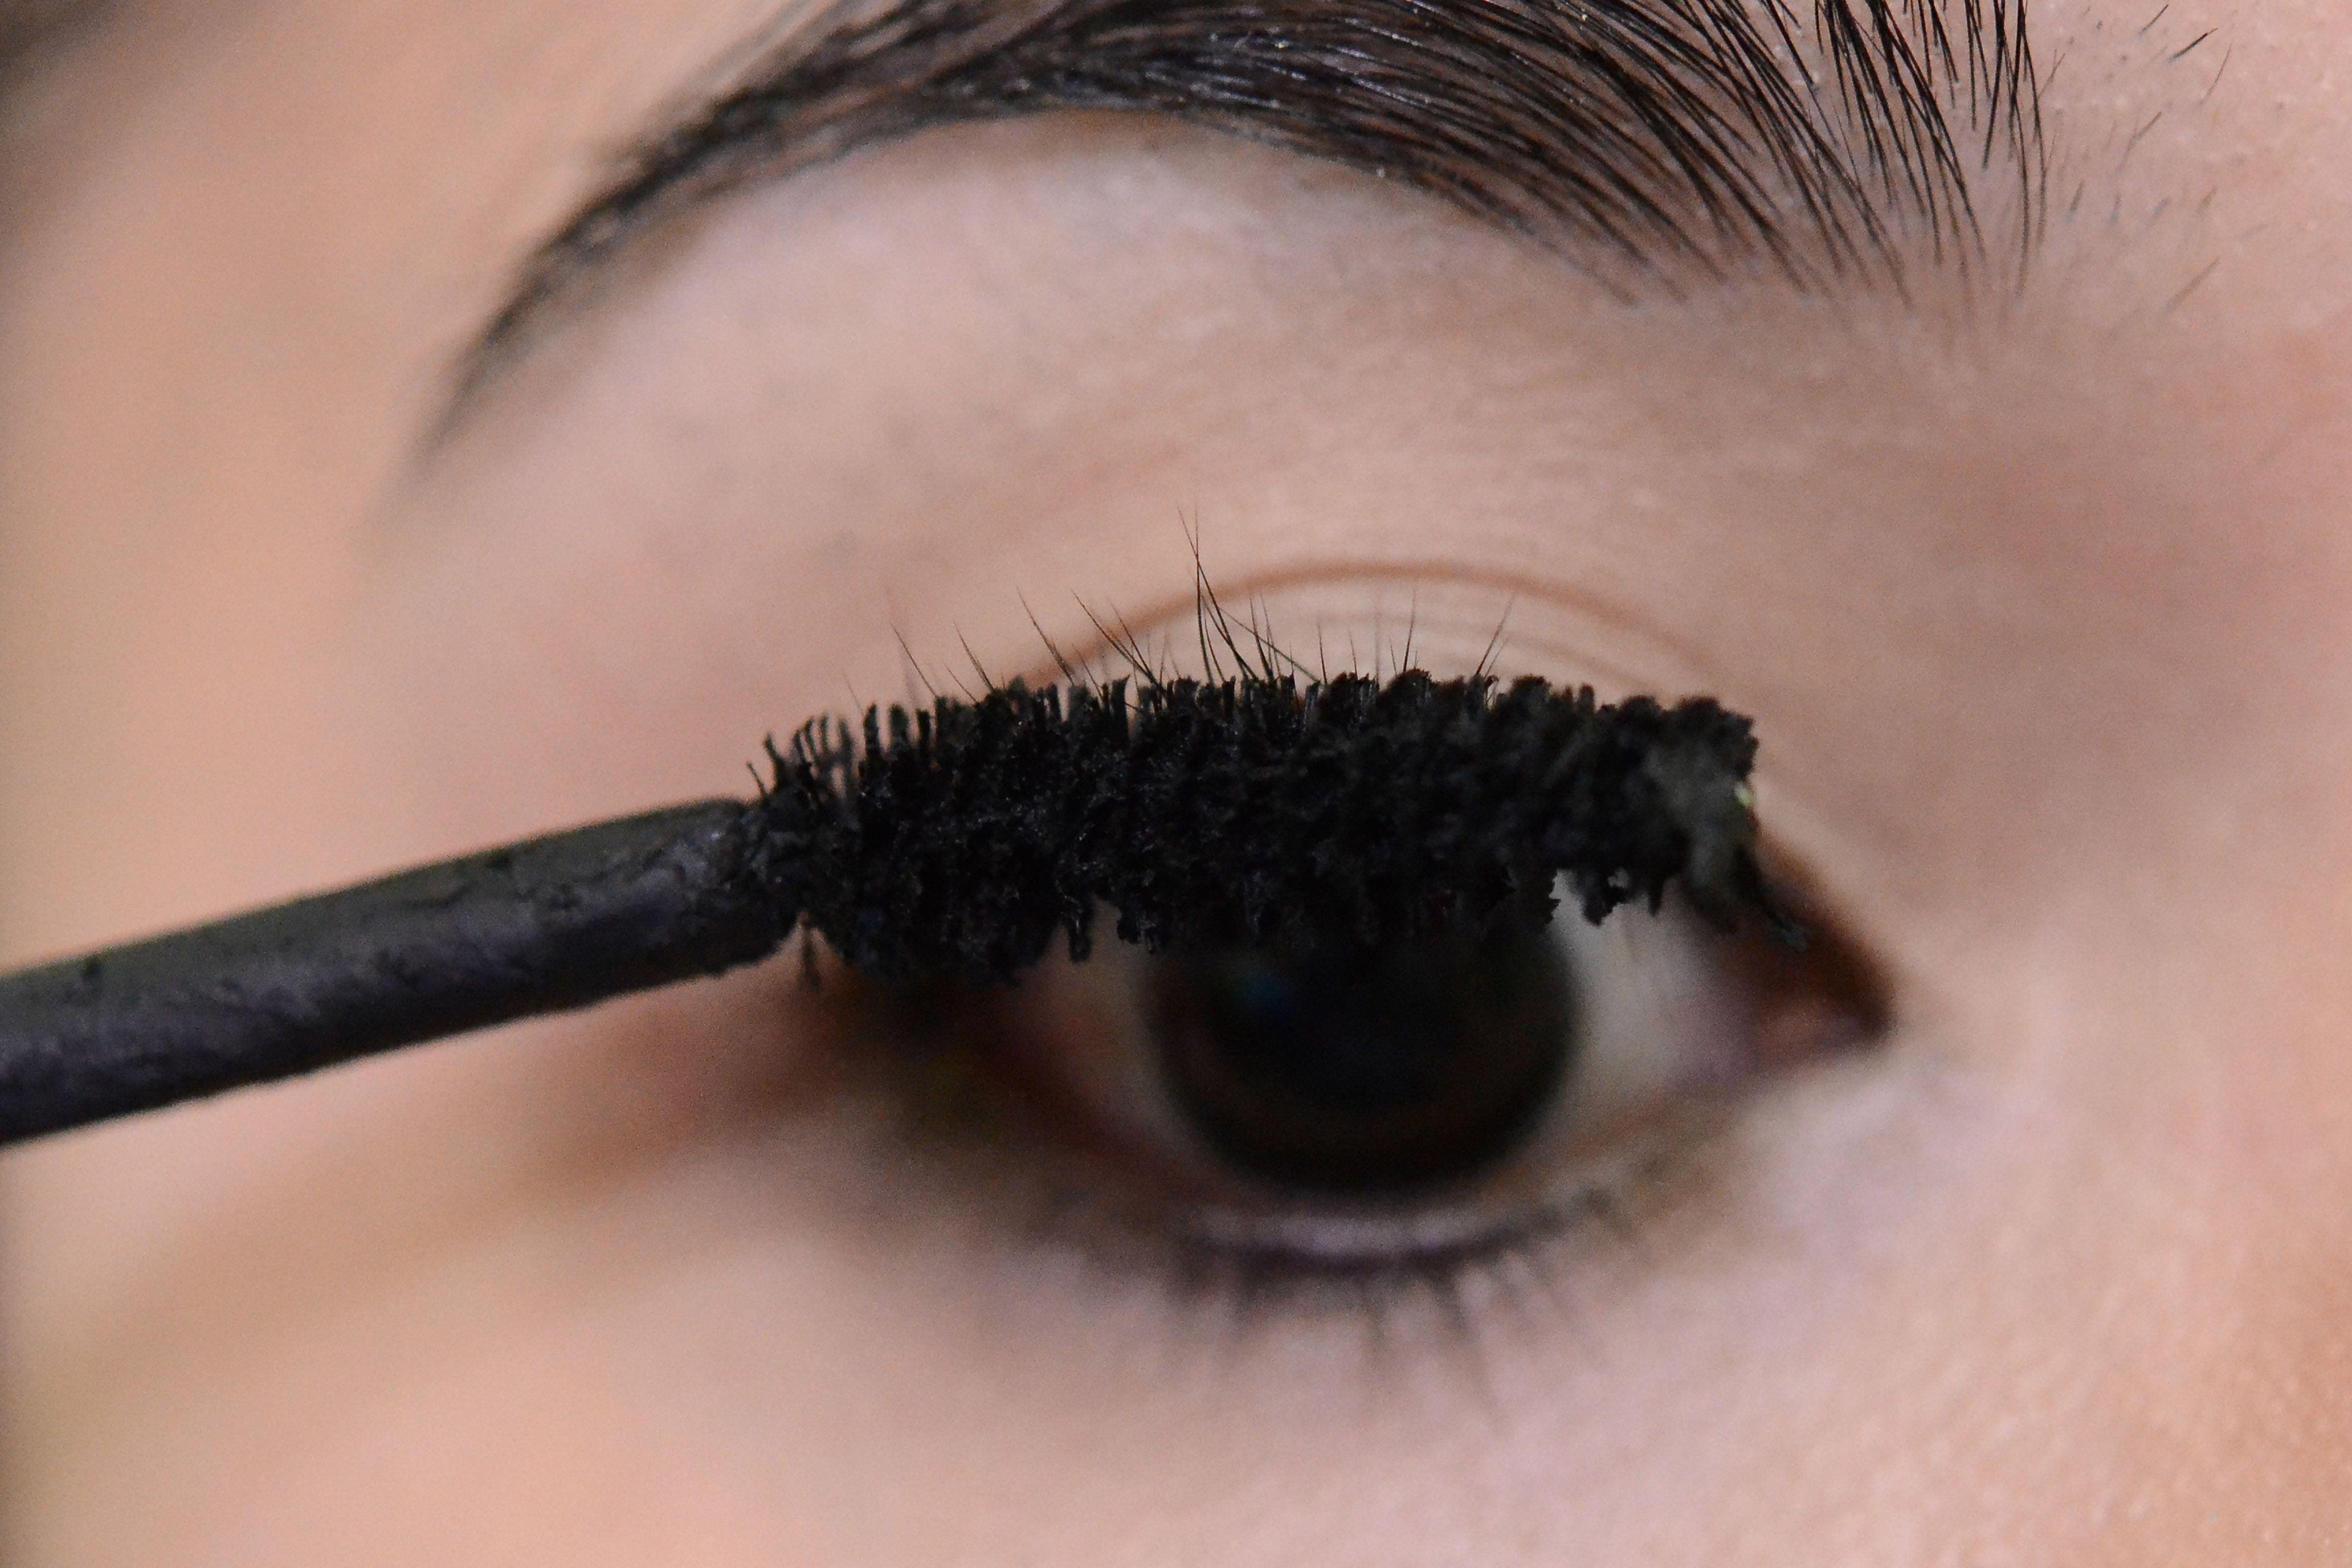 Apply Eye Makeup (for Women Over 50) Applying eye makeup